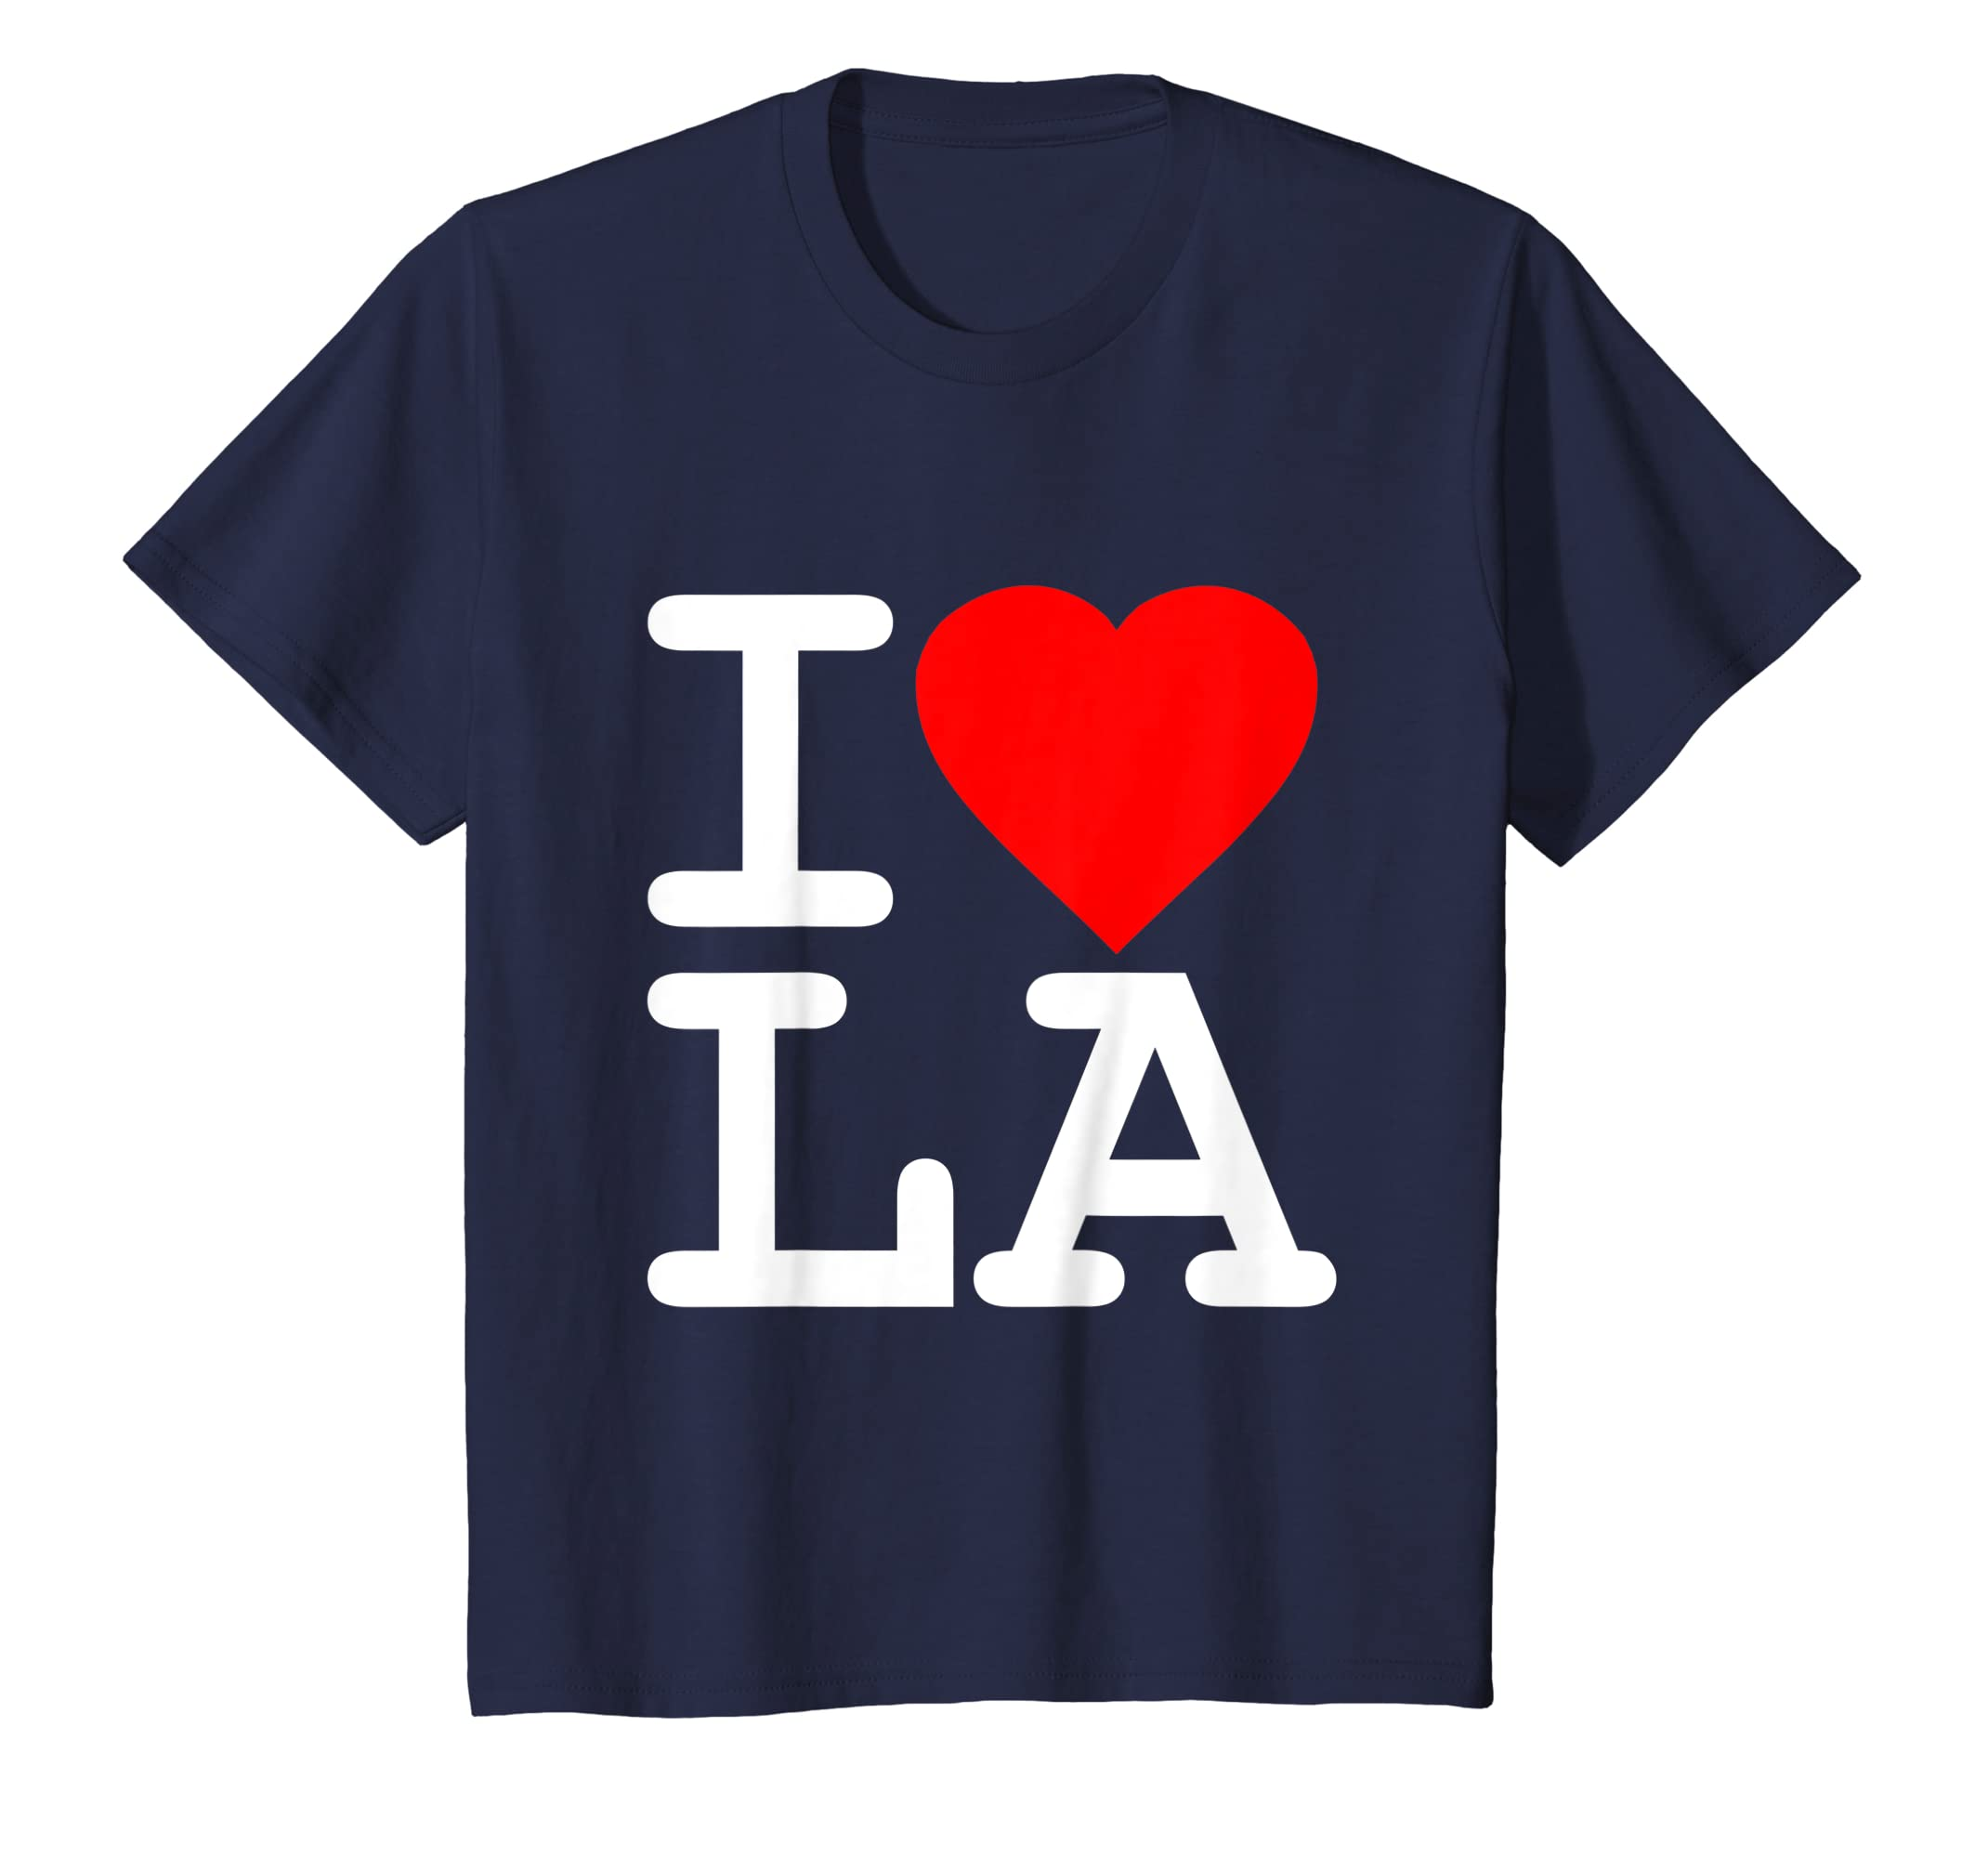 41c4d26038c9 Amazon.com  I Love LA Los Angeles T-Shirt  Clothing